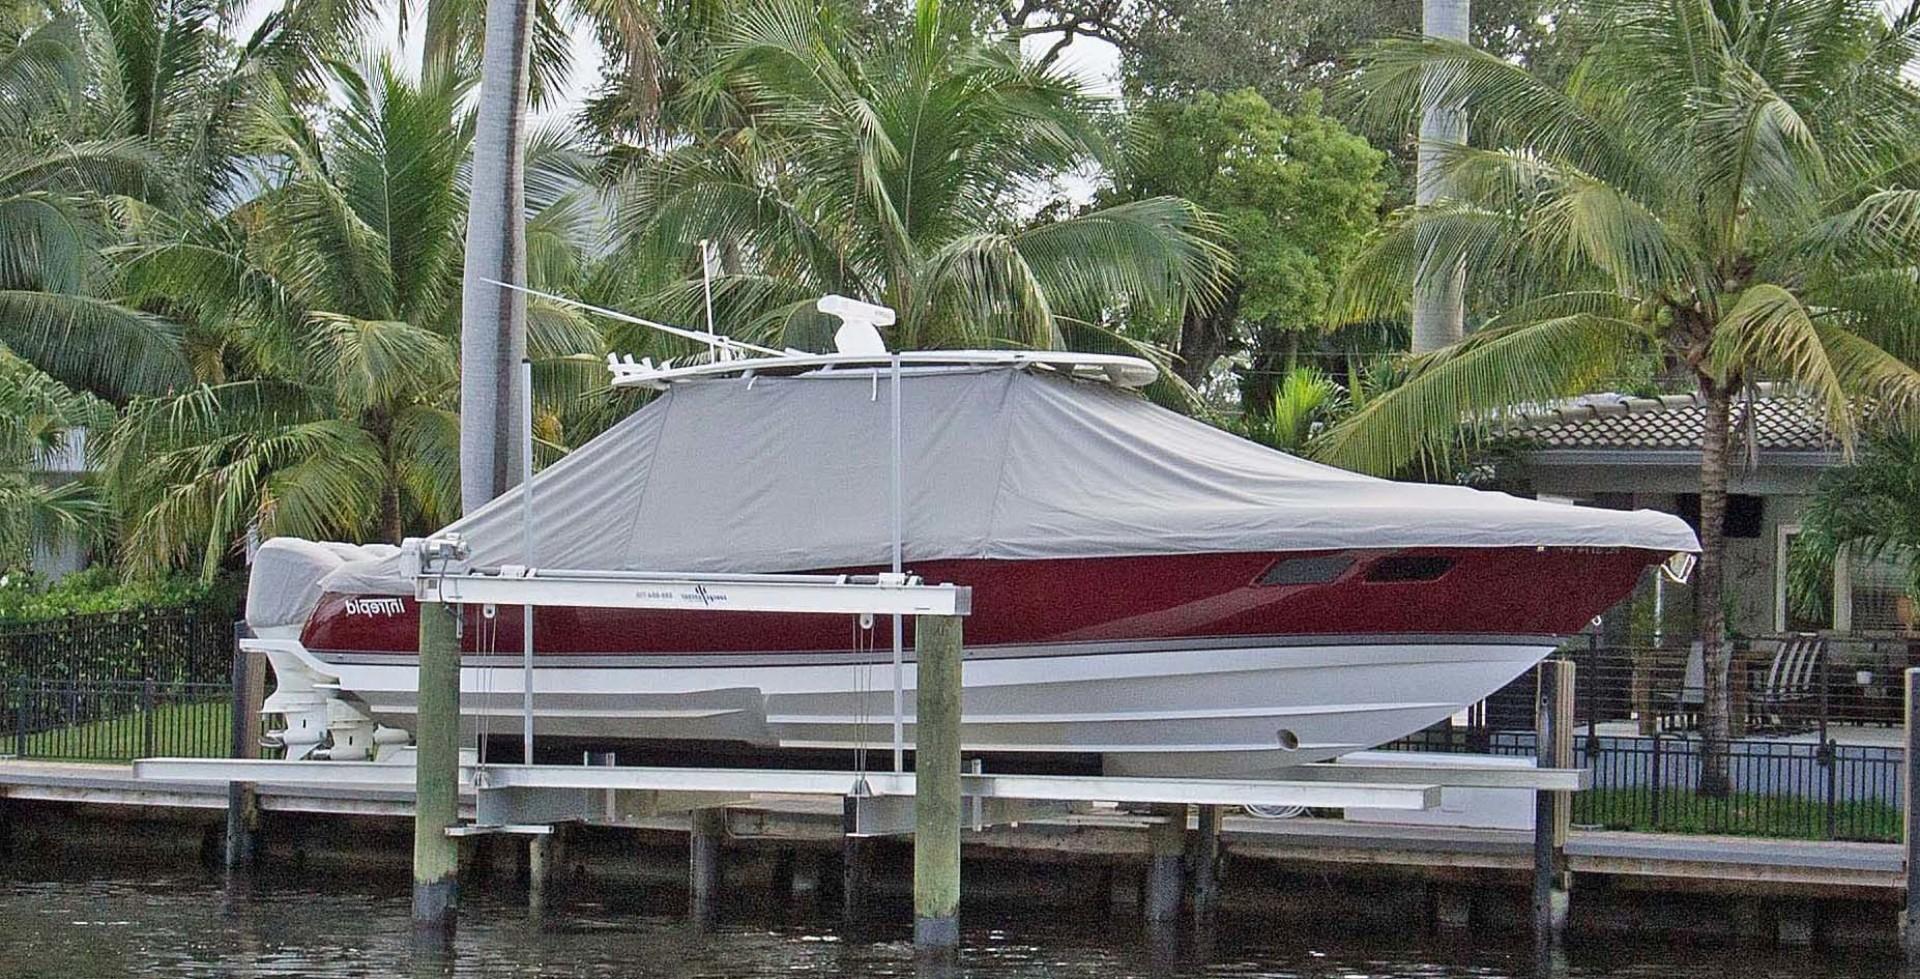 Intrepid-375 Walkaround 2014-NN 375 Walkaround 2014 Fort Lauderdale-Florida-United States-1508360 | Thumbnail